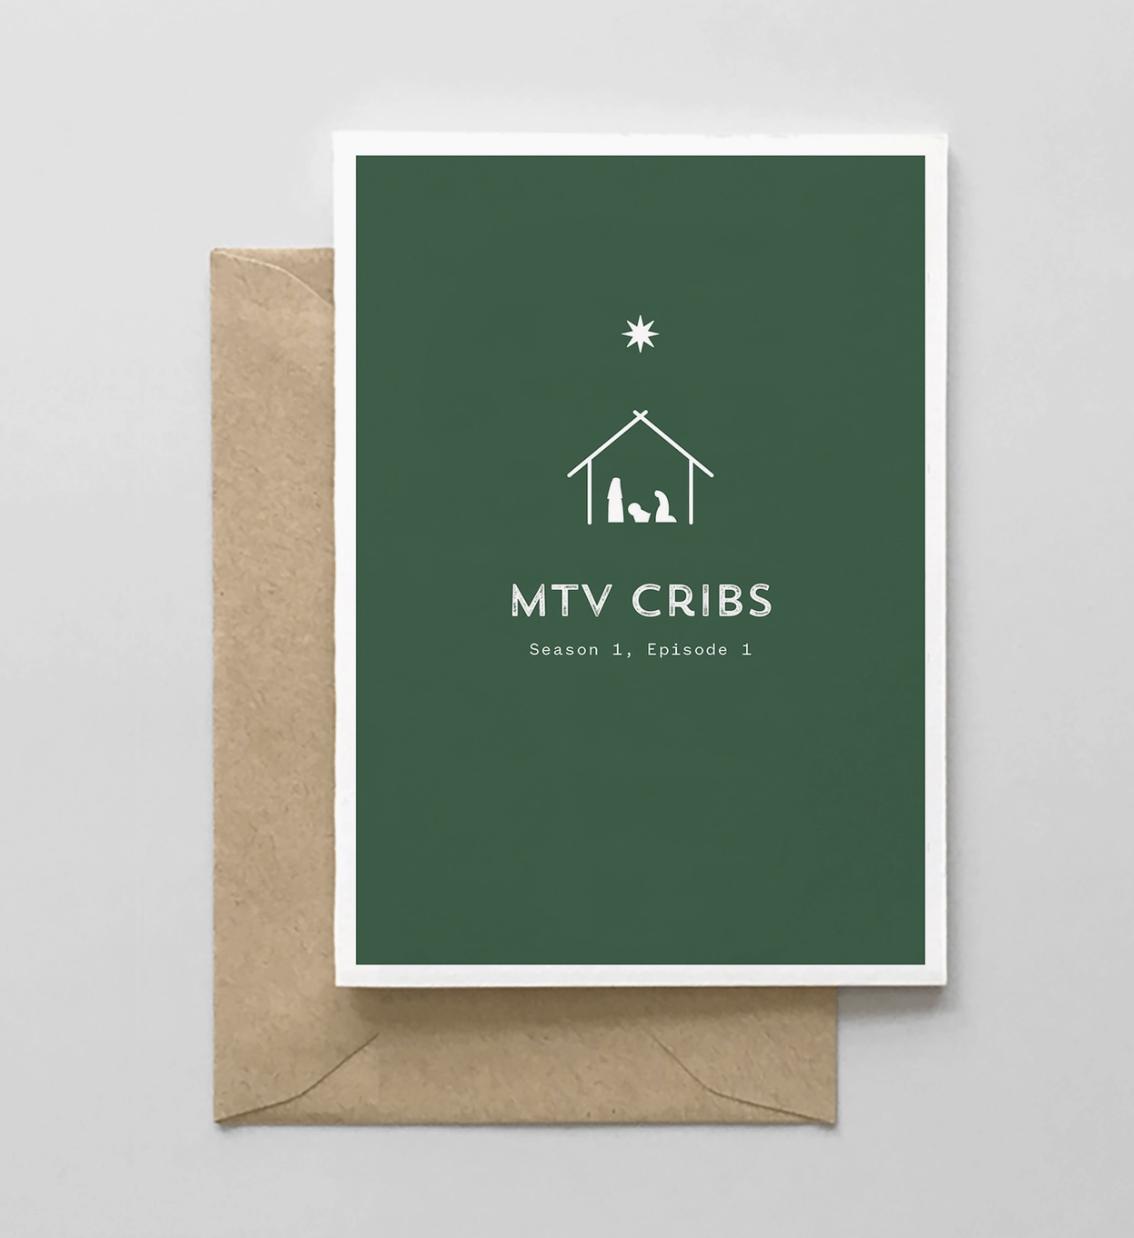 Spaghetti & Meatballs MTV Cribs